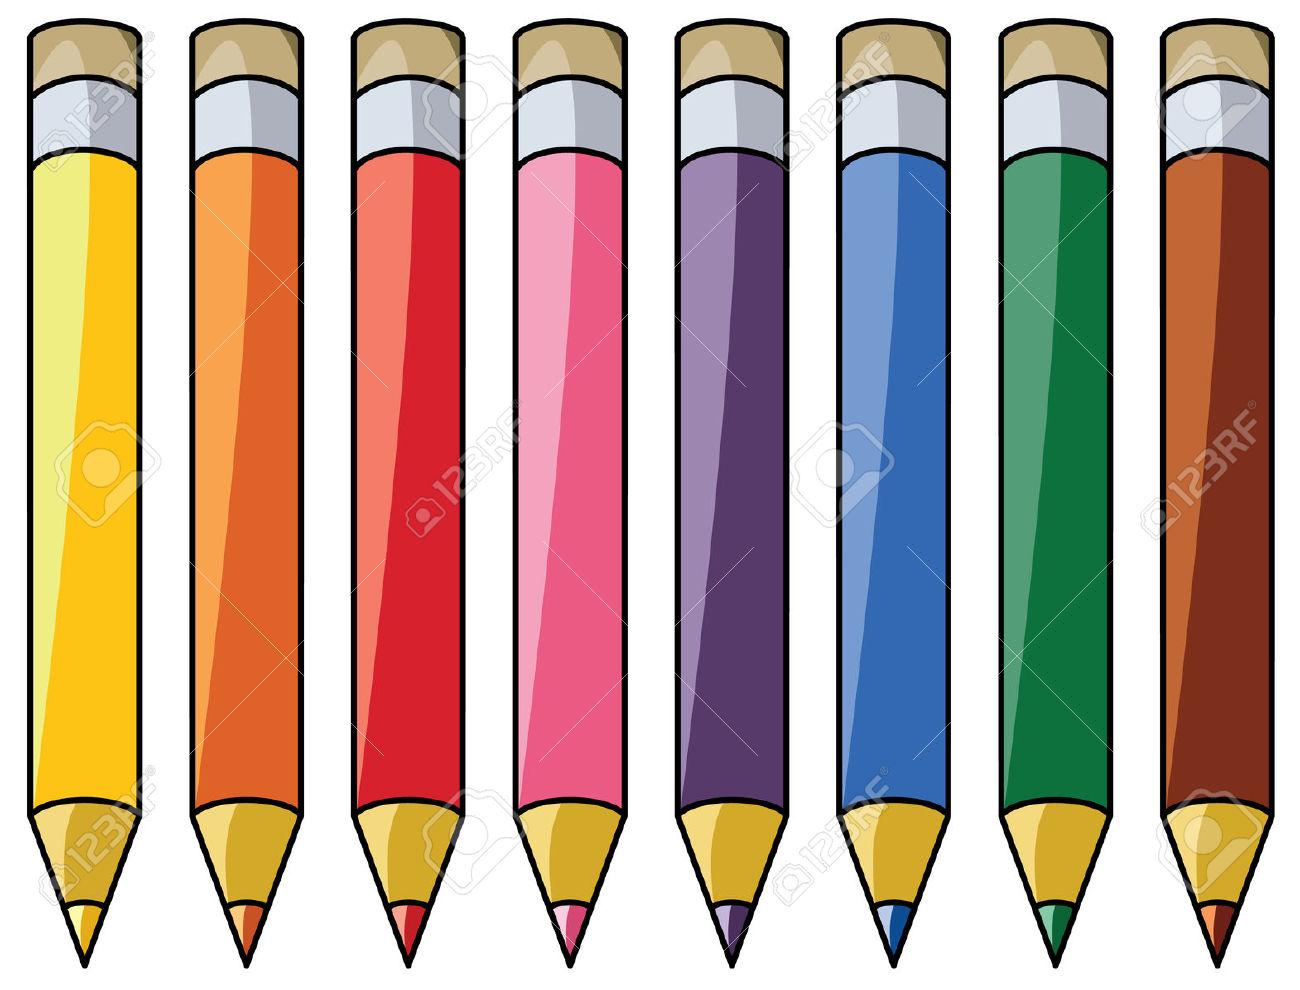 1300x990 Free Pencil Clipart Public Domain Pencil Clip Art Images And Image